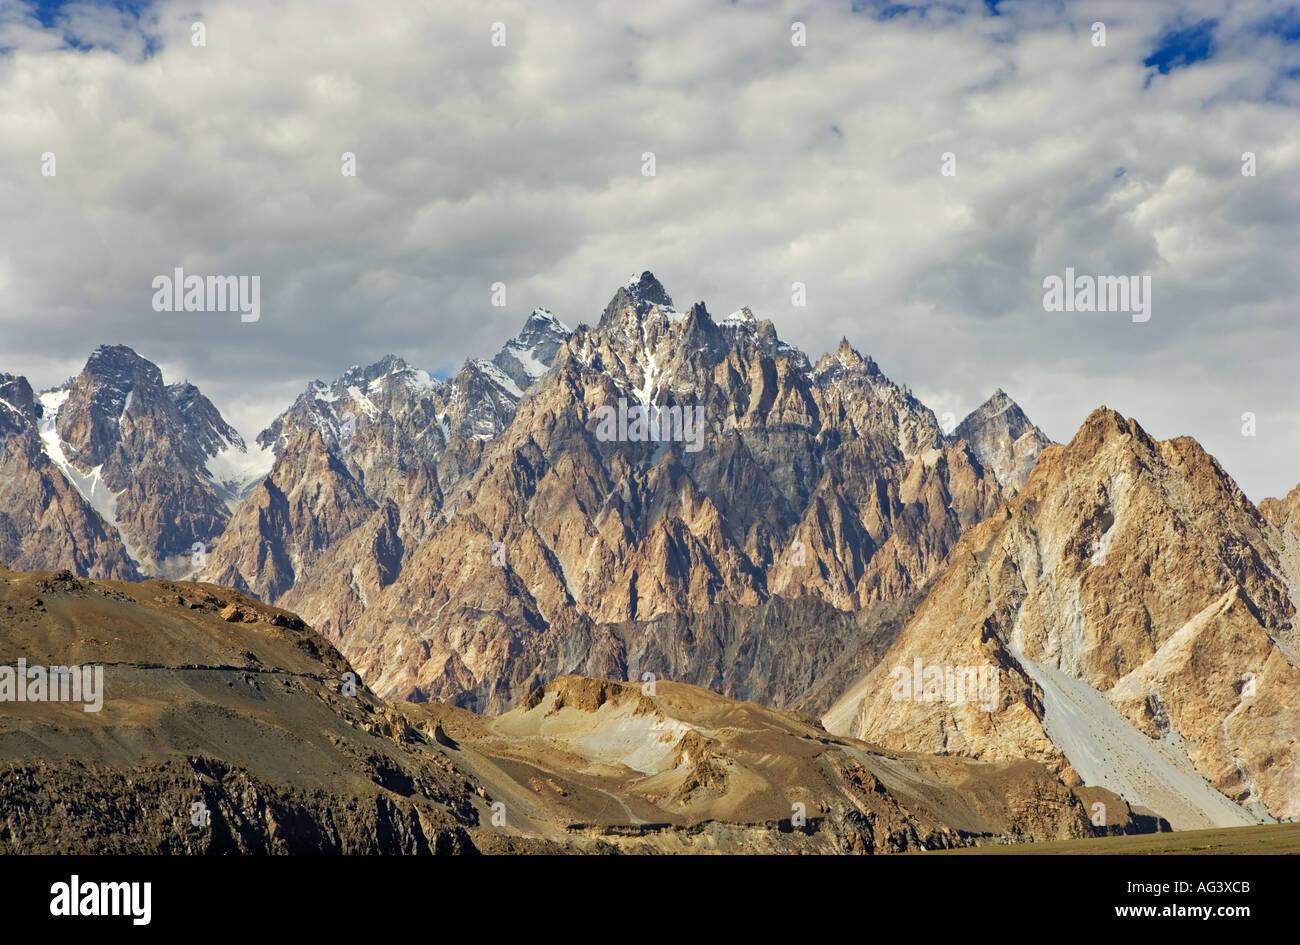 The Passu cones of Hunza as seen from the Karakoram Highway in northern Pakistan - Stock Image